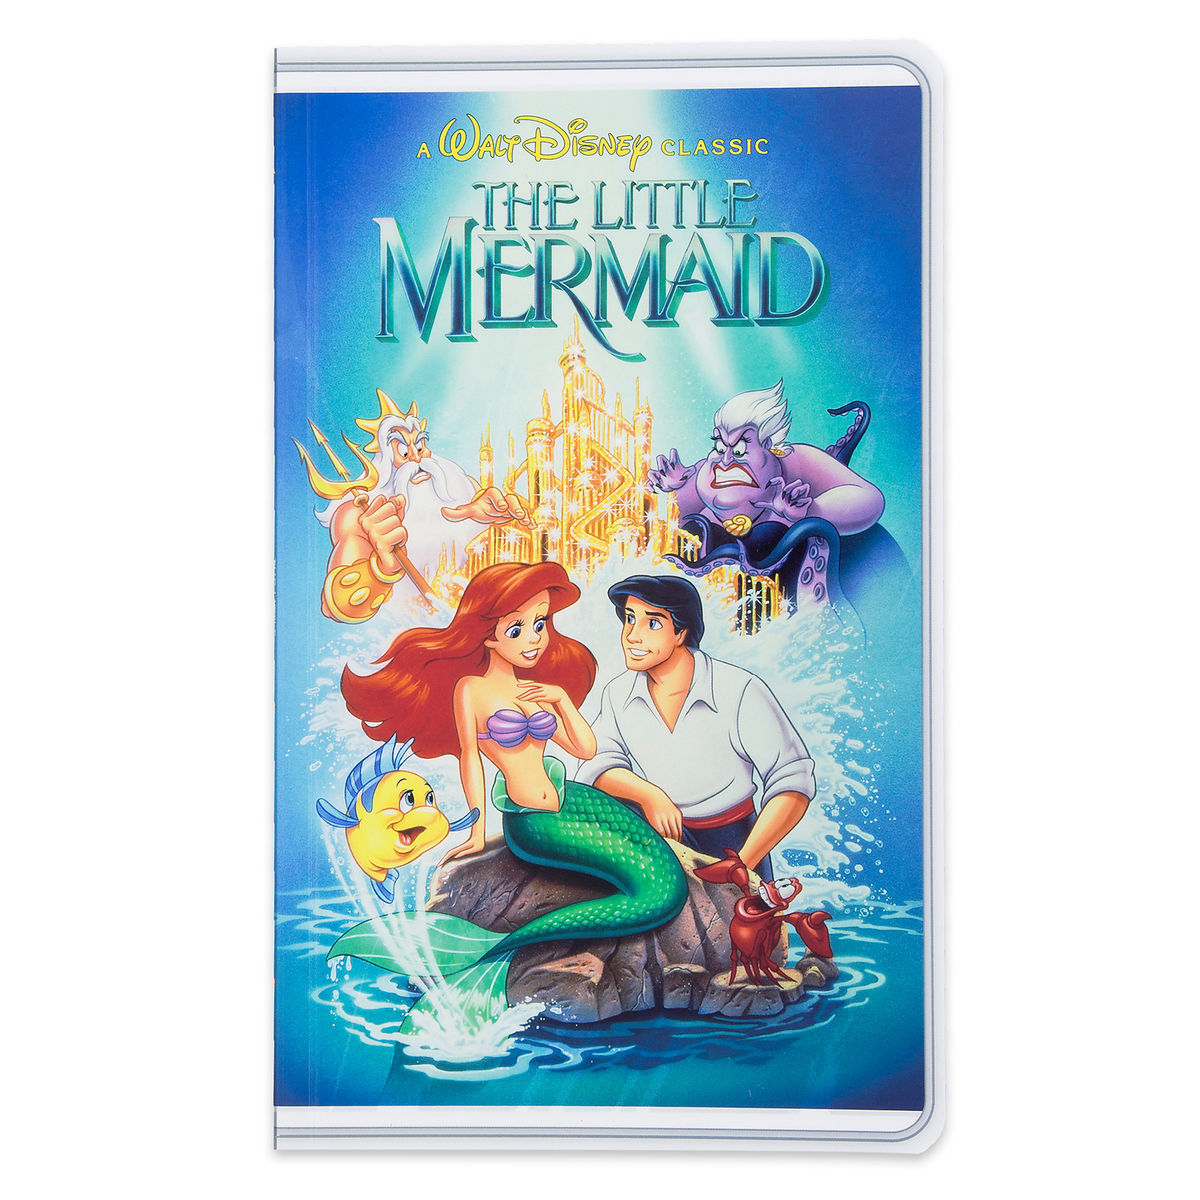 back to school supplies best disney merchandise the little mermaid journal vhs case